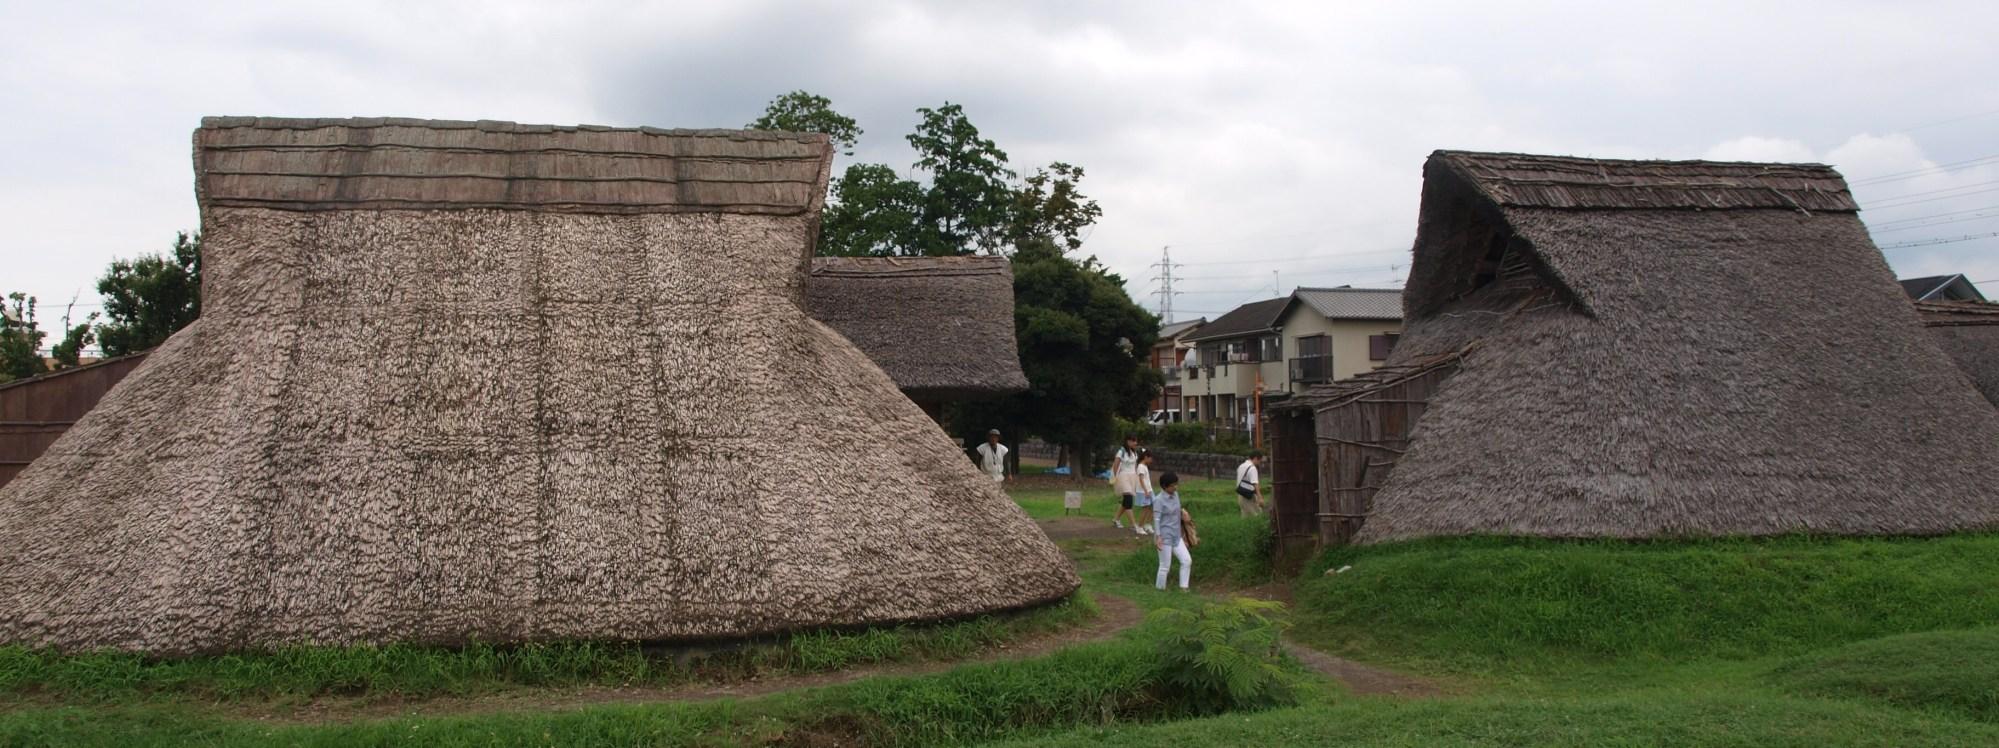 Toro Iseki, Shizuoka. 1700 year old site showing stone age (Yayoi) Japanese culture being influenced by Chinese civilisation